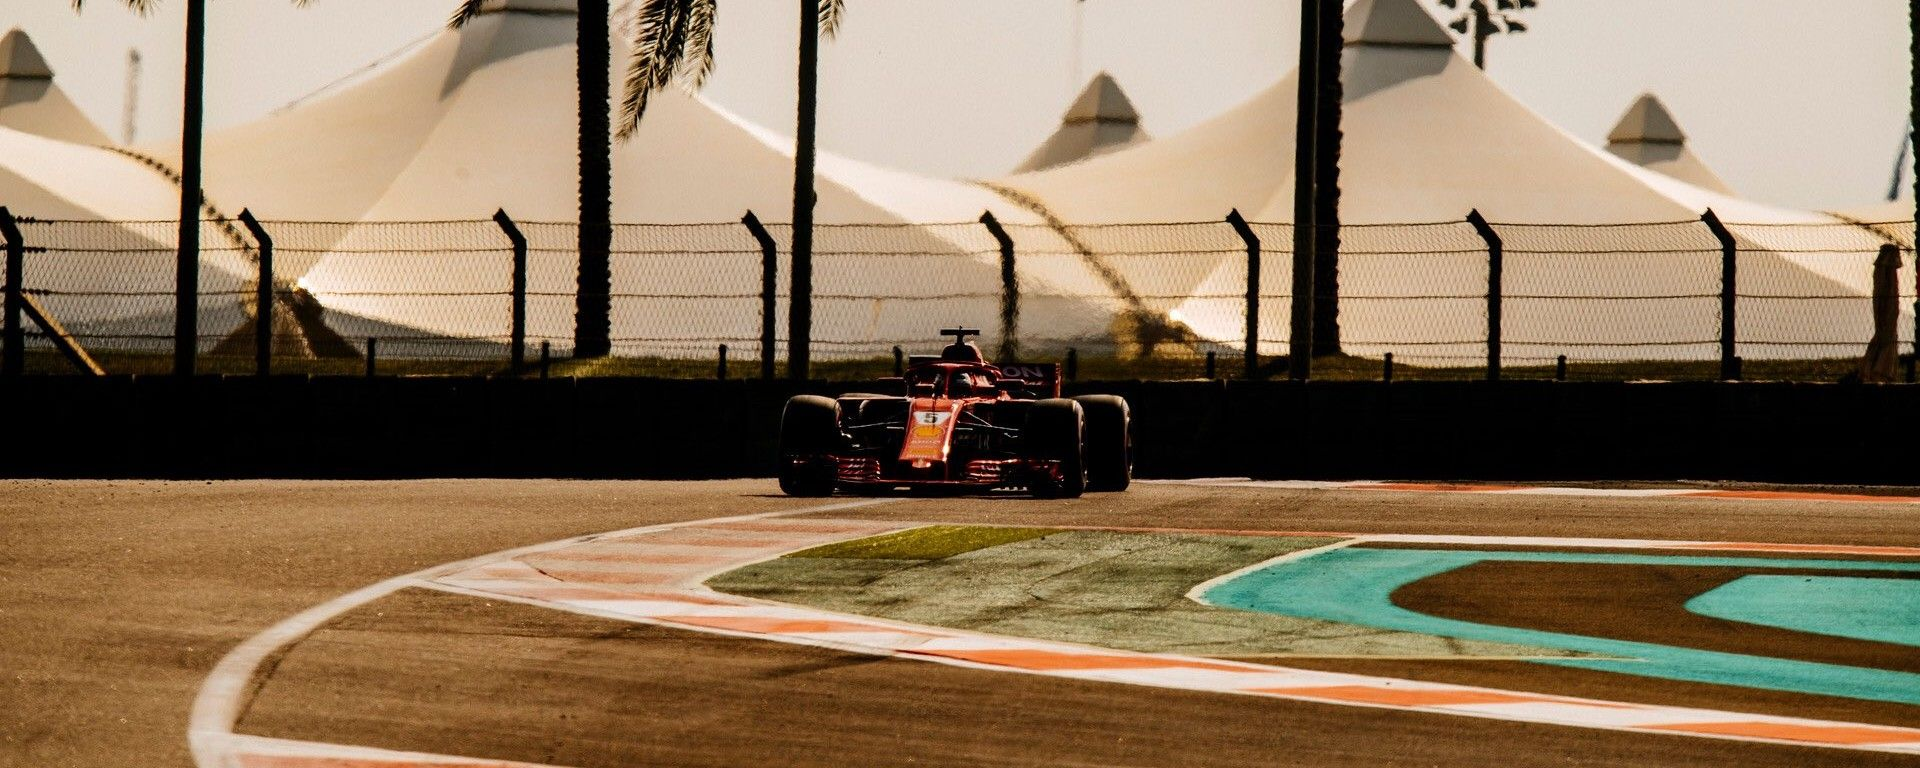 Test Pirelli Abu Dhabi 2018 - Sebastian Vettel (Ferrari)